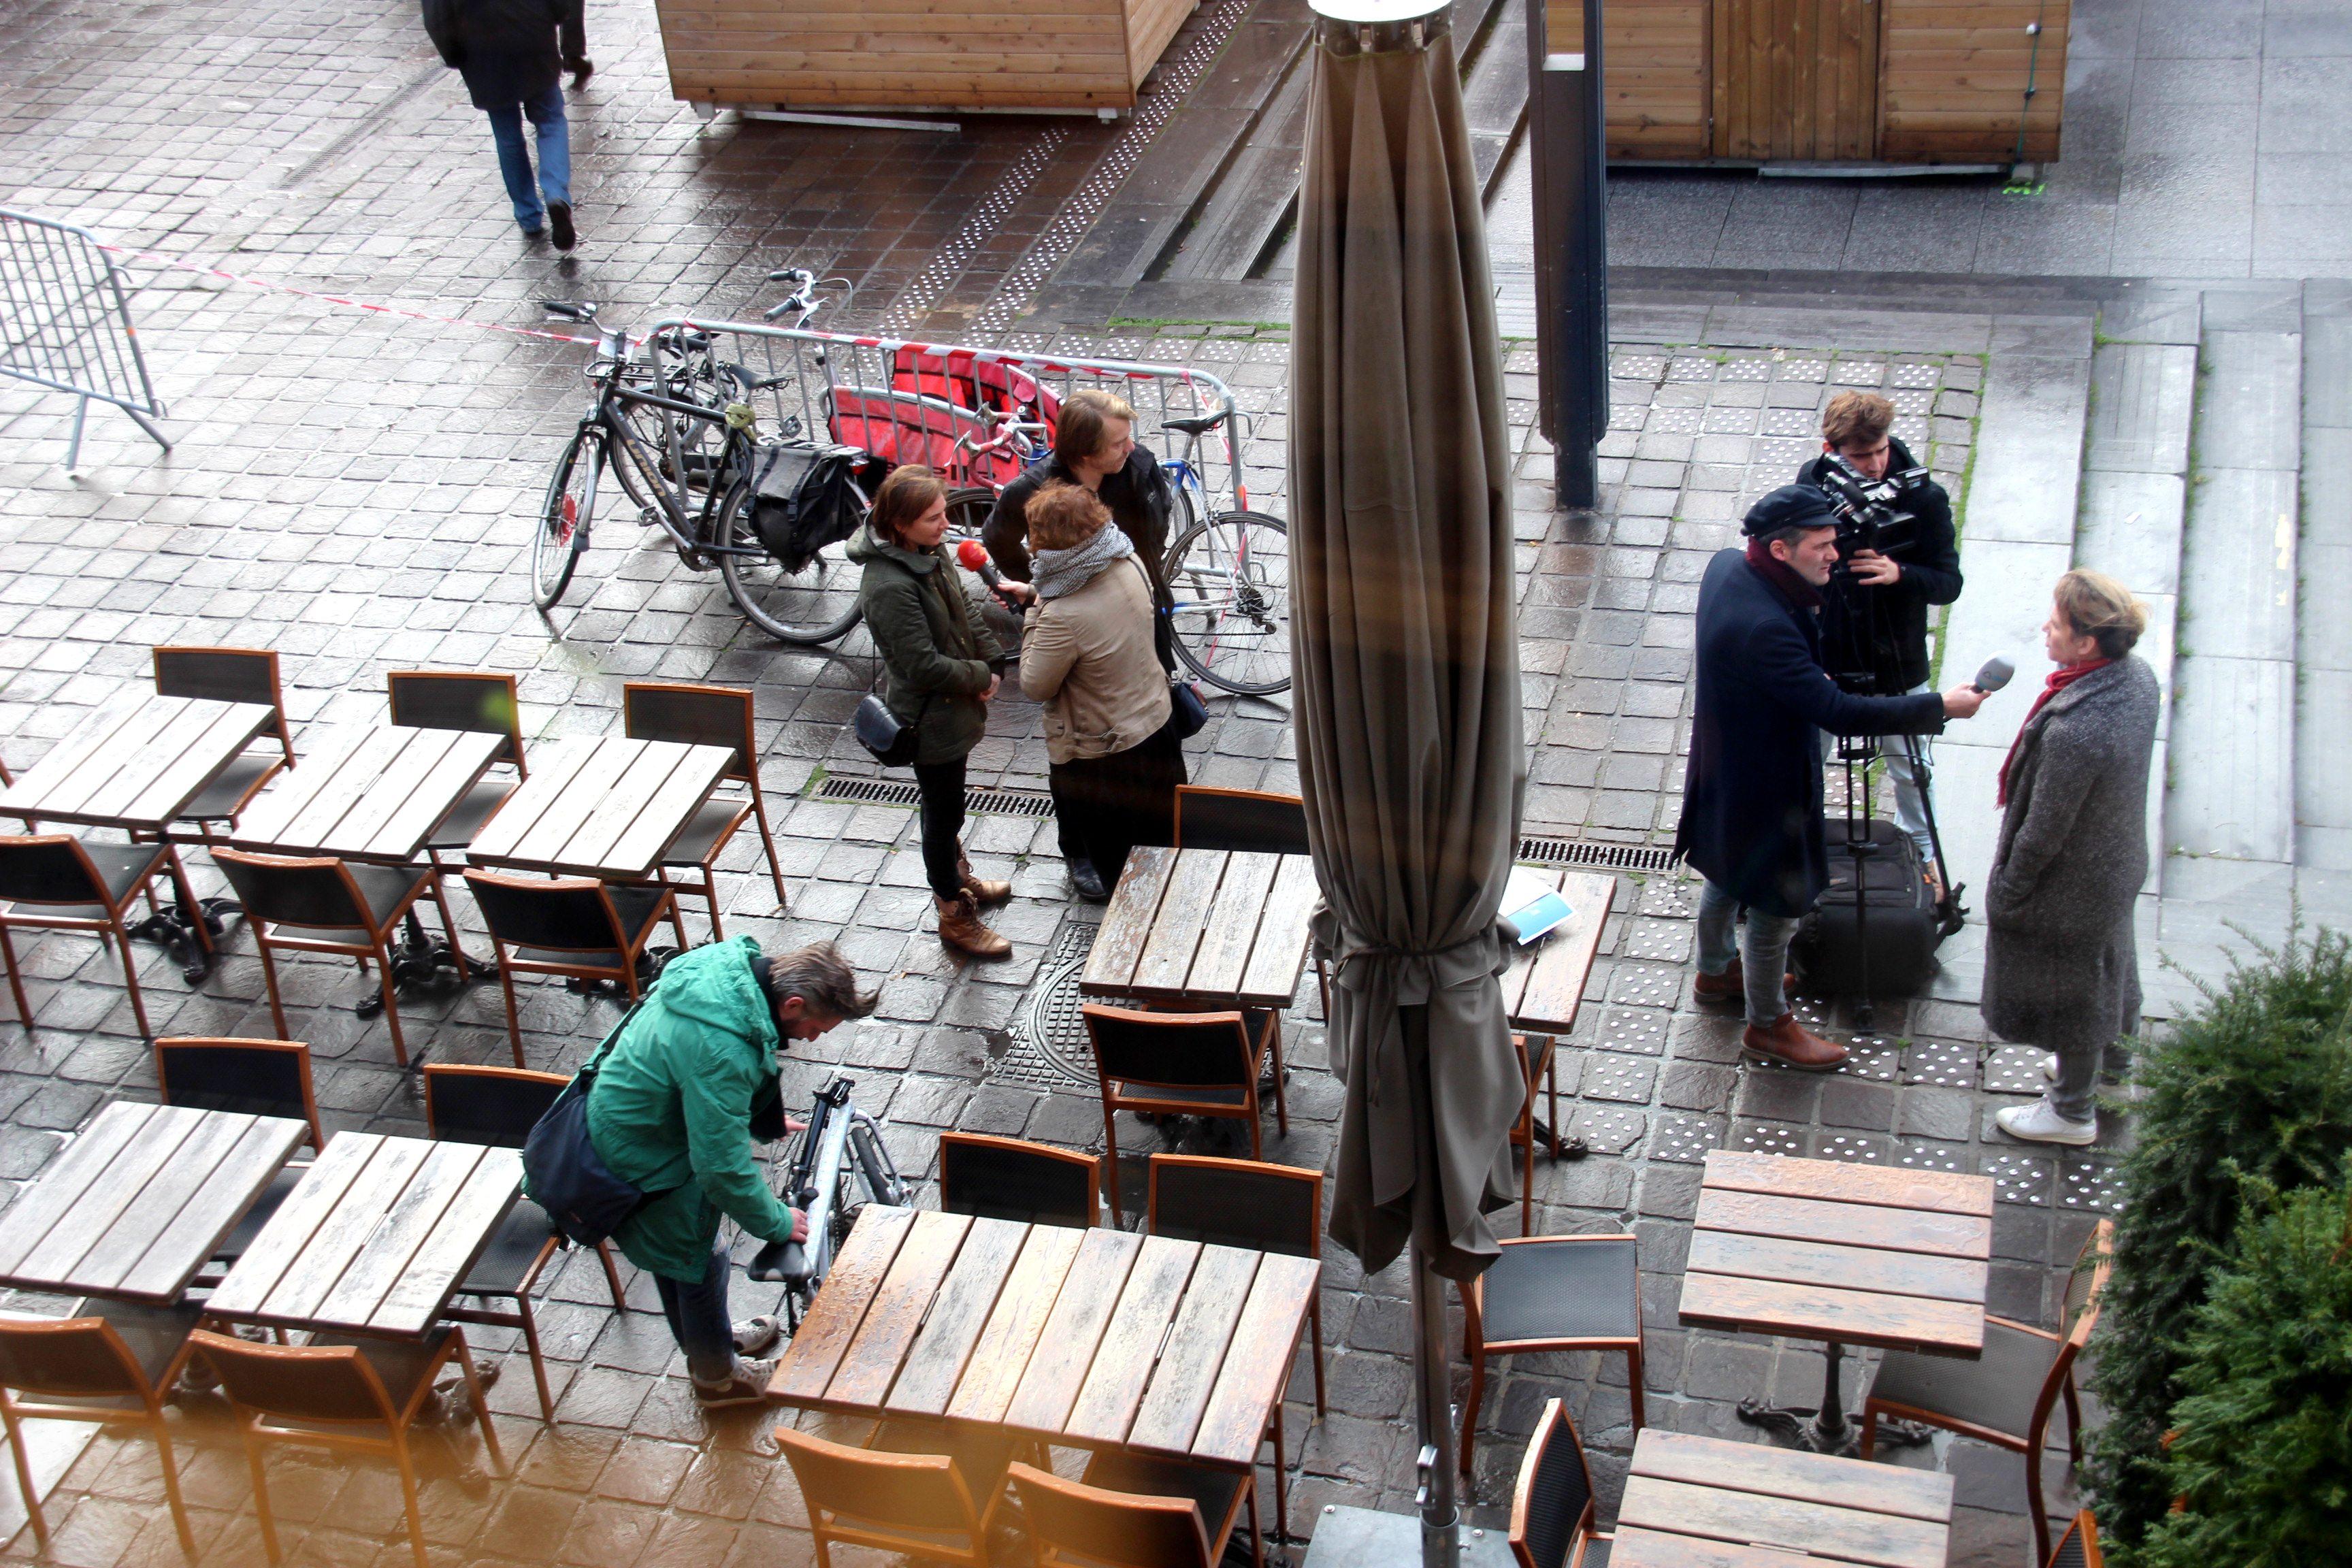 26nov15, Sint-Baafsplein